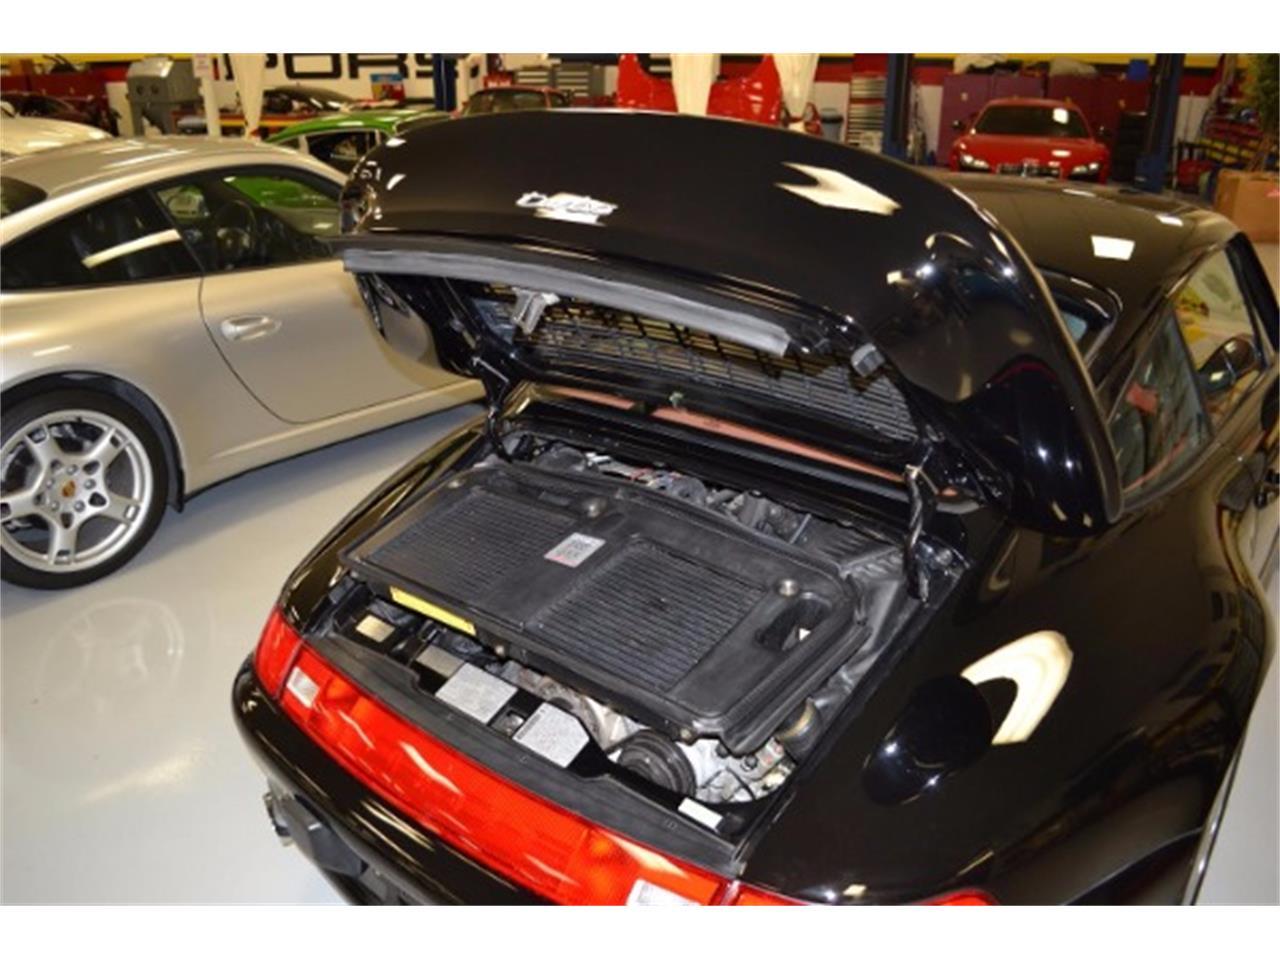 1997 Porsche 993 911 Turbo For Sale Classiccars Com Cc